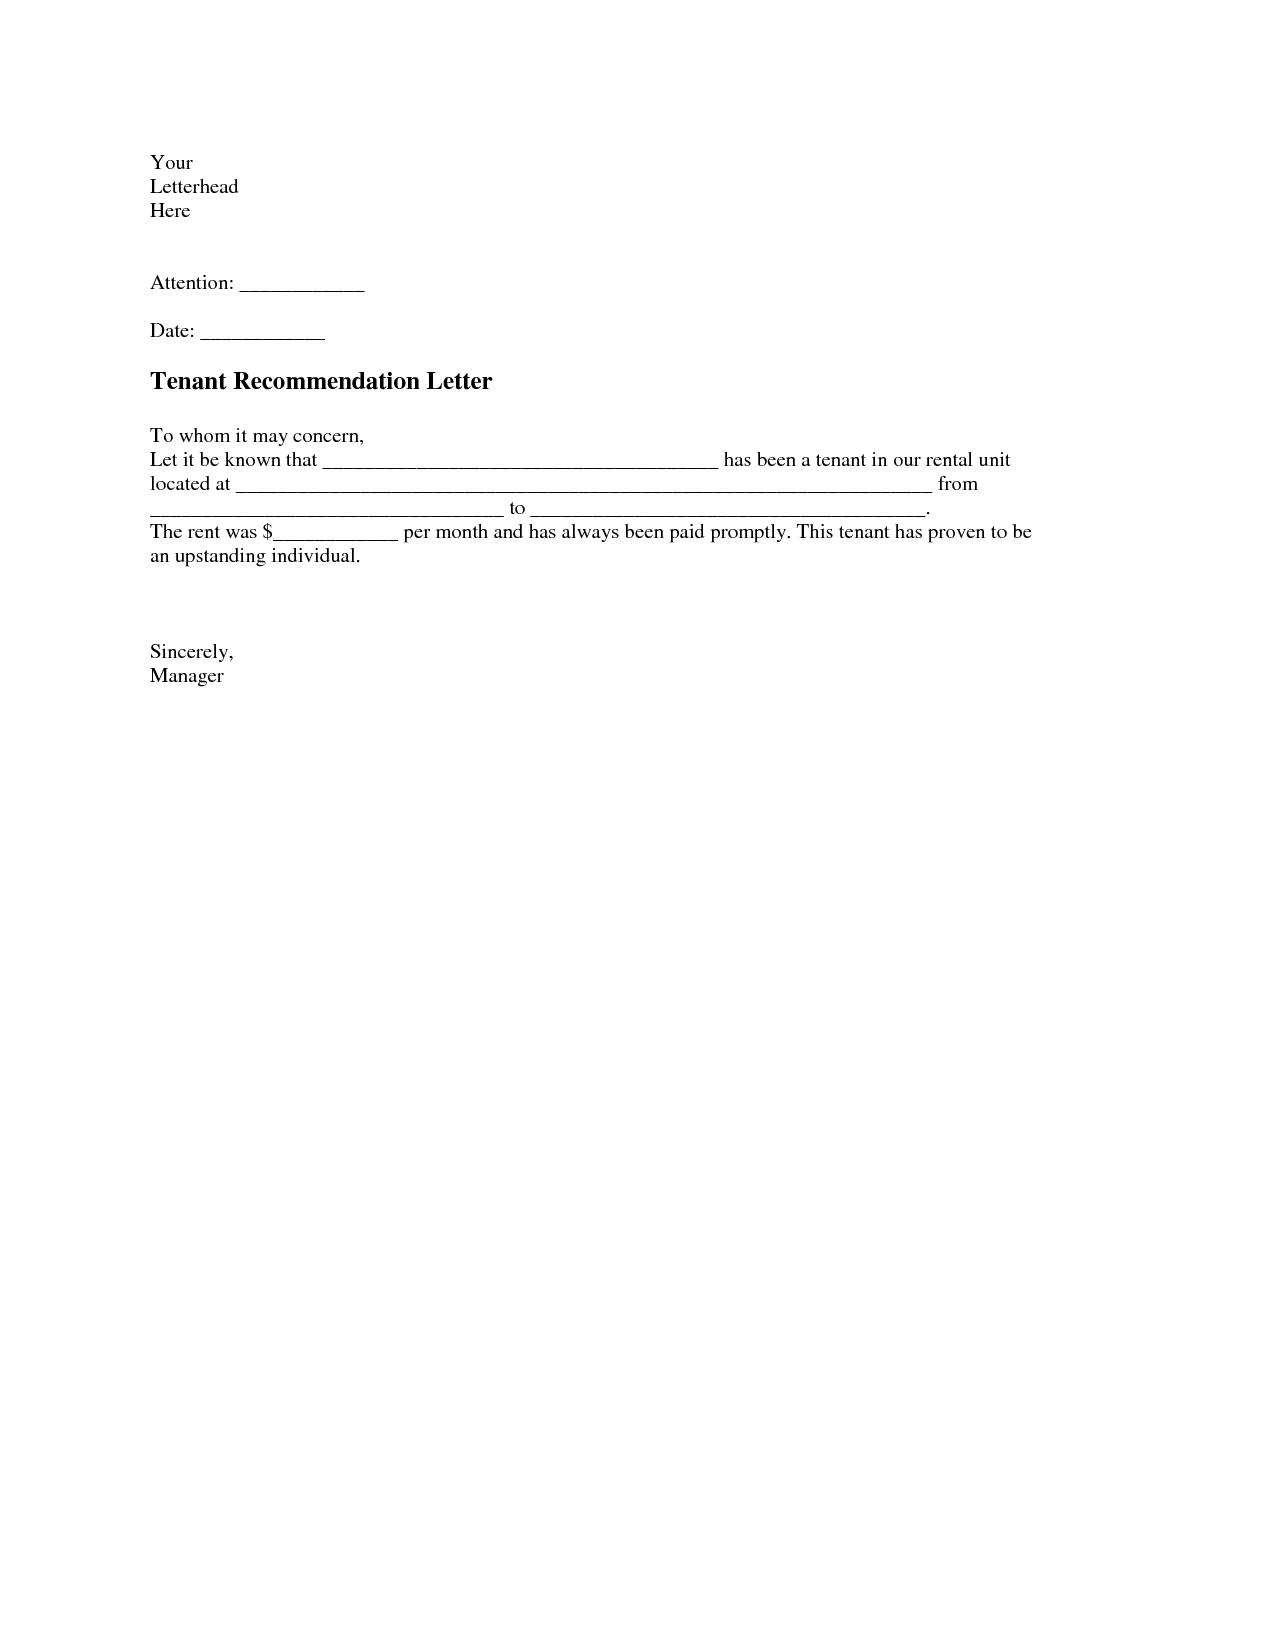 Sample Letter Of Recommendation Letter Samples Tenant Recommendation Letter A Tenant Recommendation